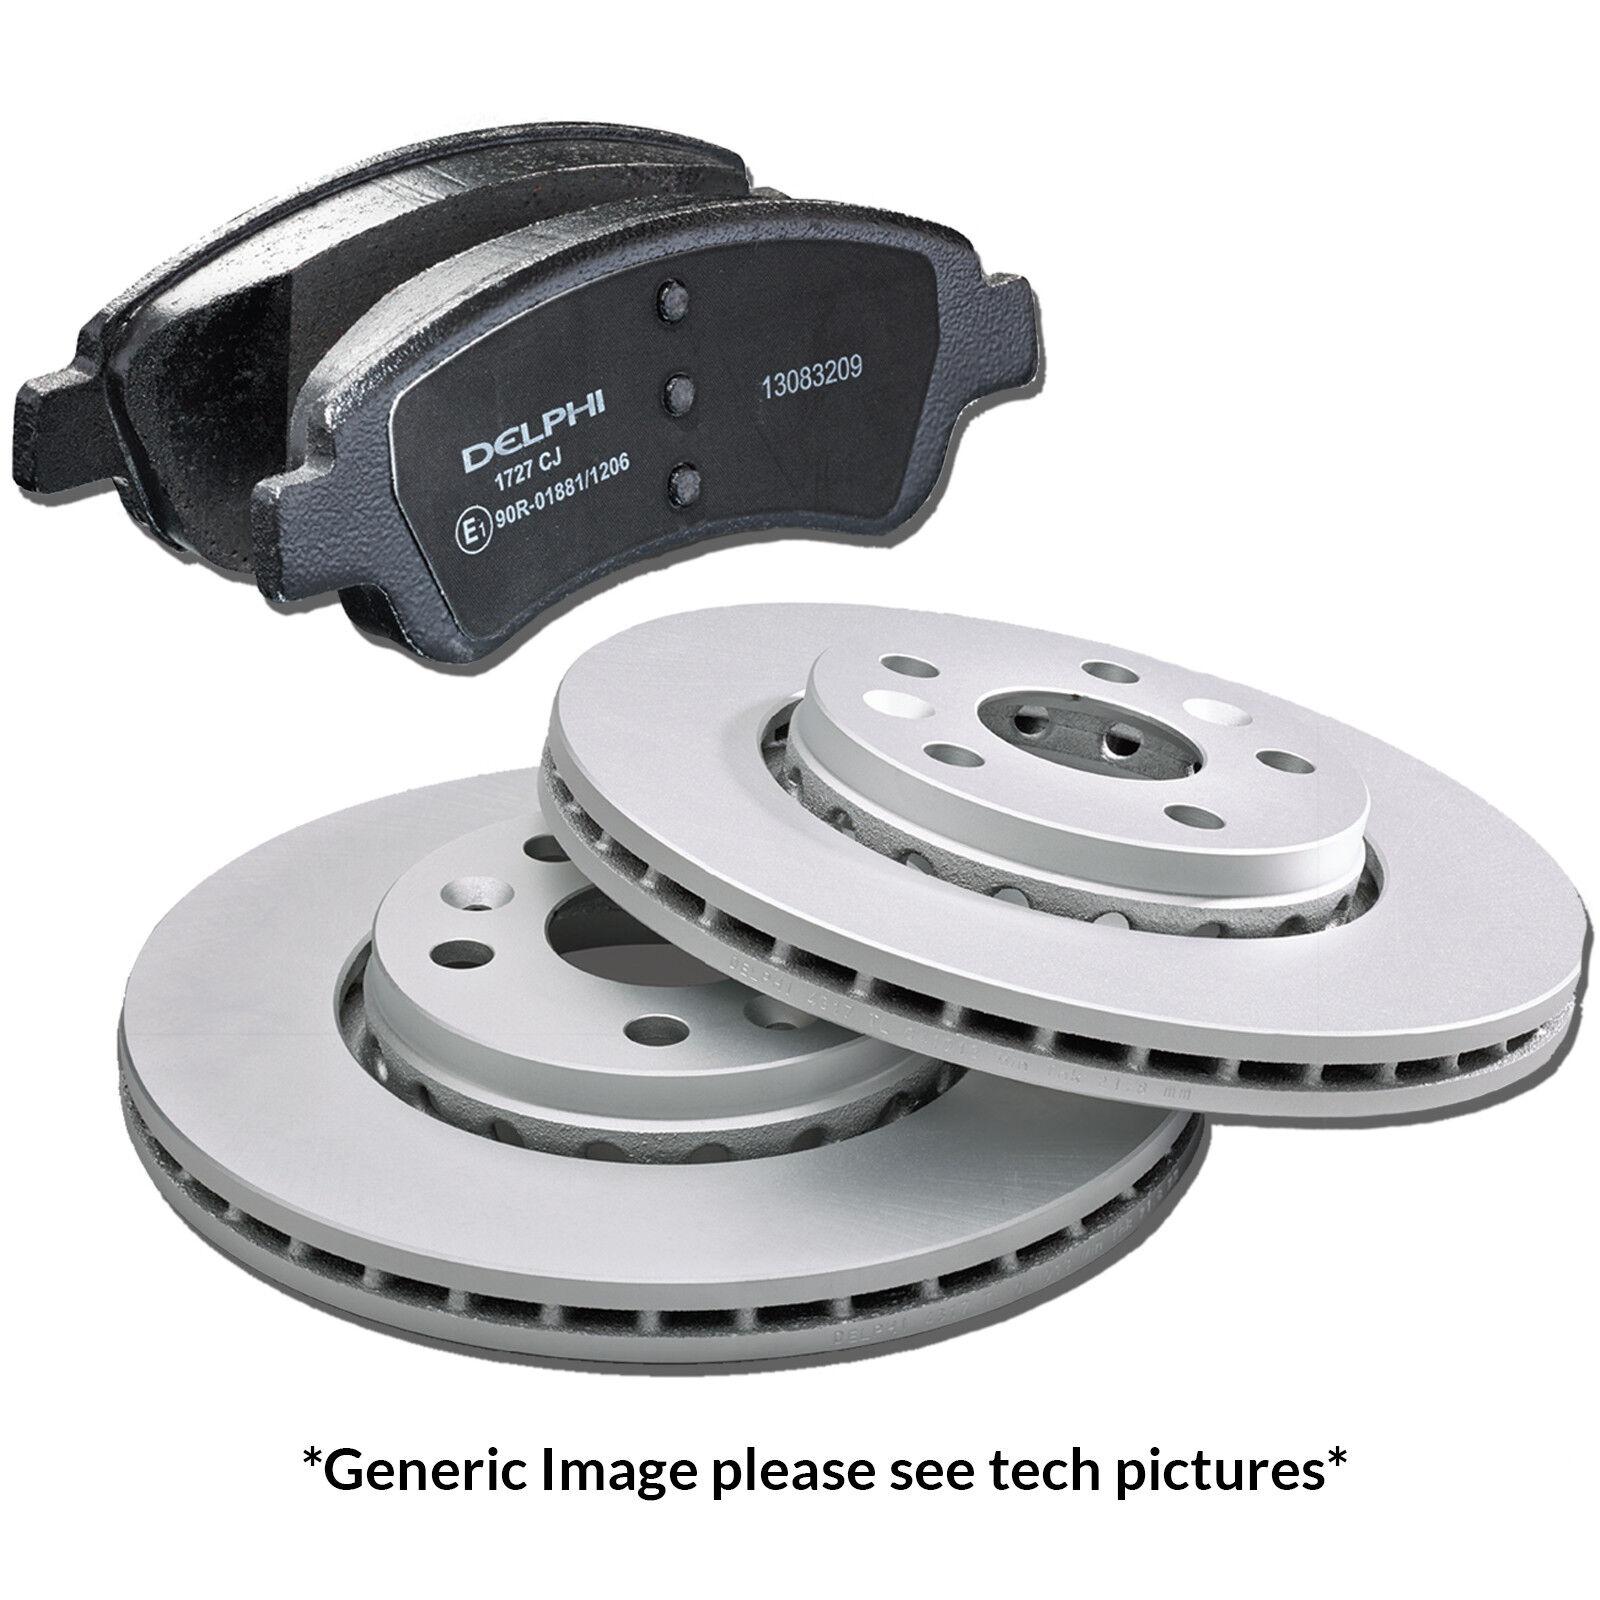 DISC PADS SET KIT FOR CITROEN XSARA PICASSO 2001--/>ON NEW REAR BRAKE DISCS